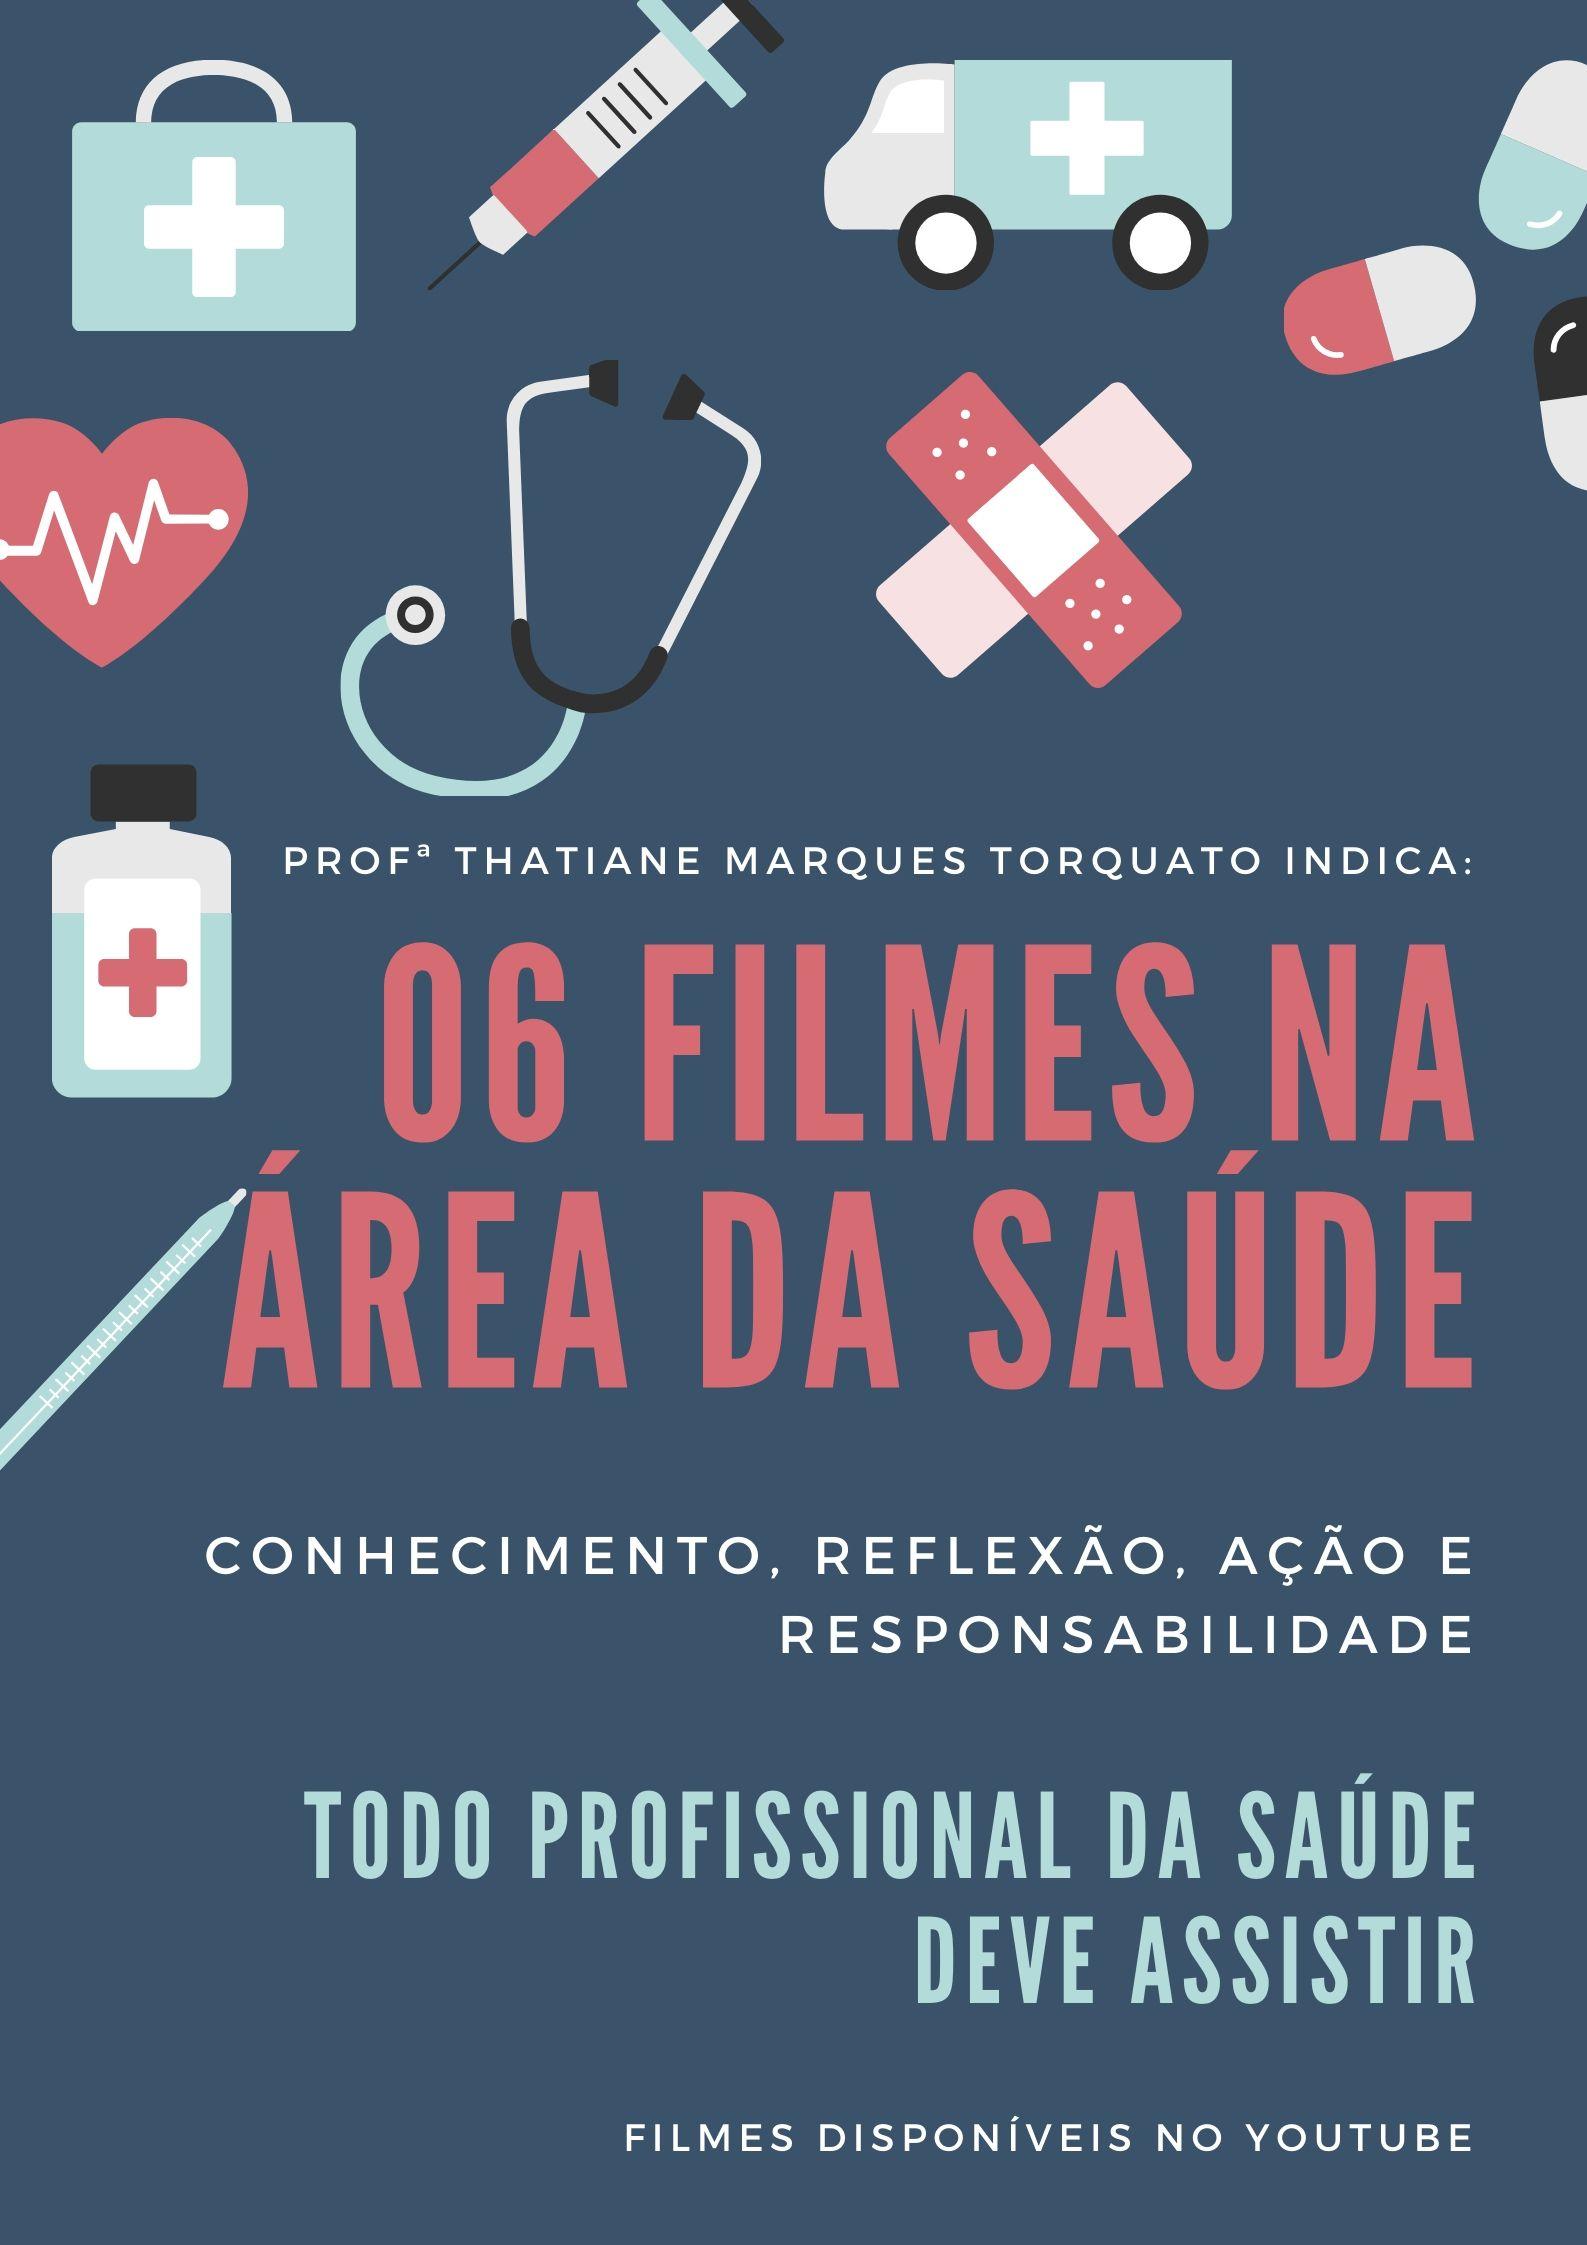 FILMES PROFª THATIANE